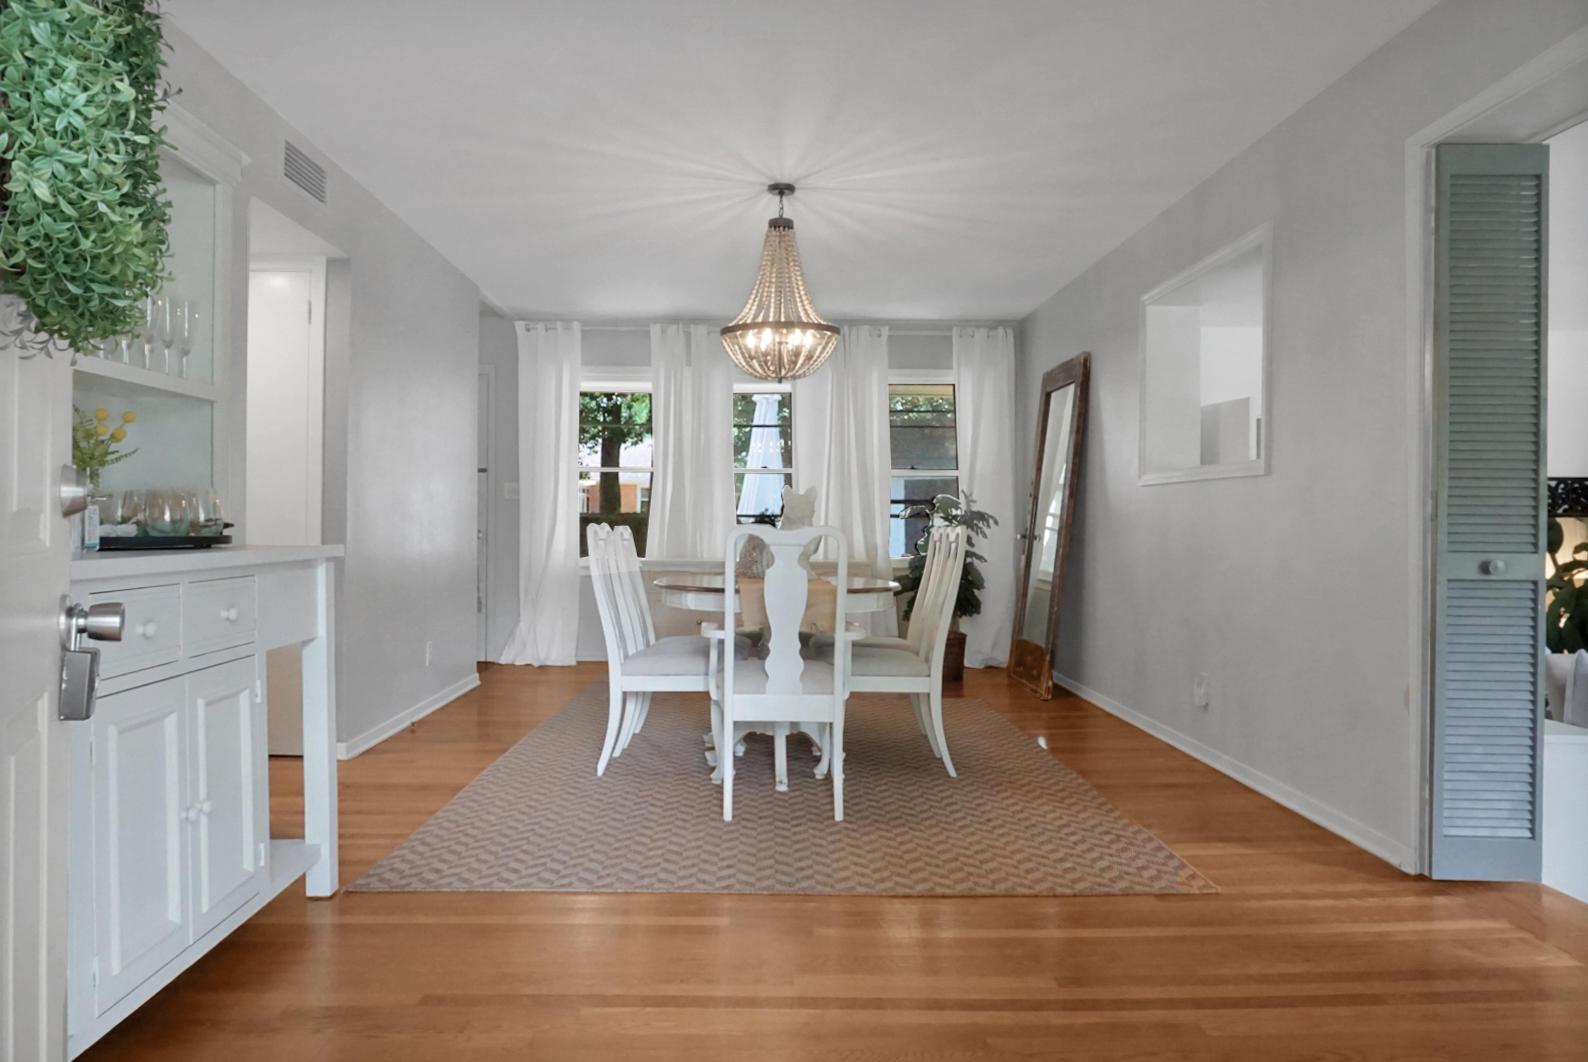 Oakland Homes For Sale - 408 Arlington, Charleston, SC - 19